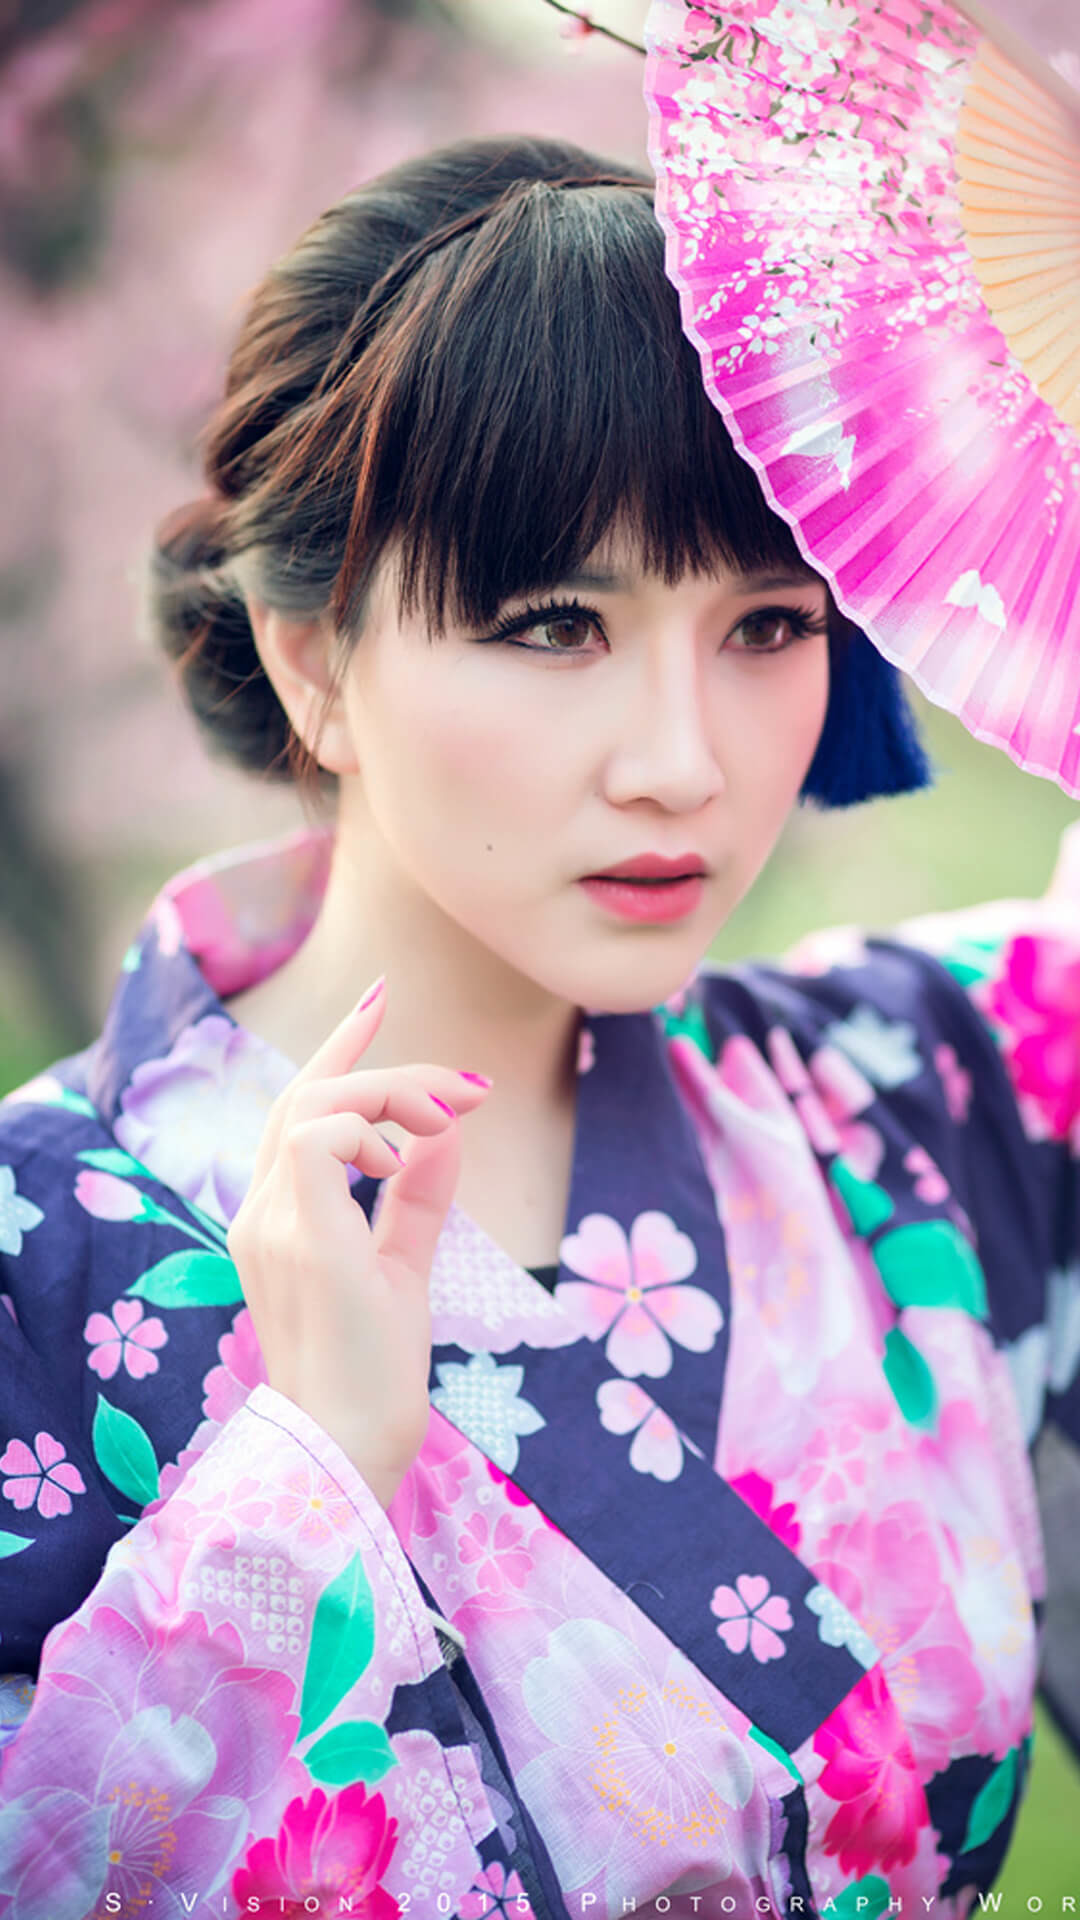 Hot Japanese Culture Girl iPhone Wallpaper. Download